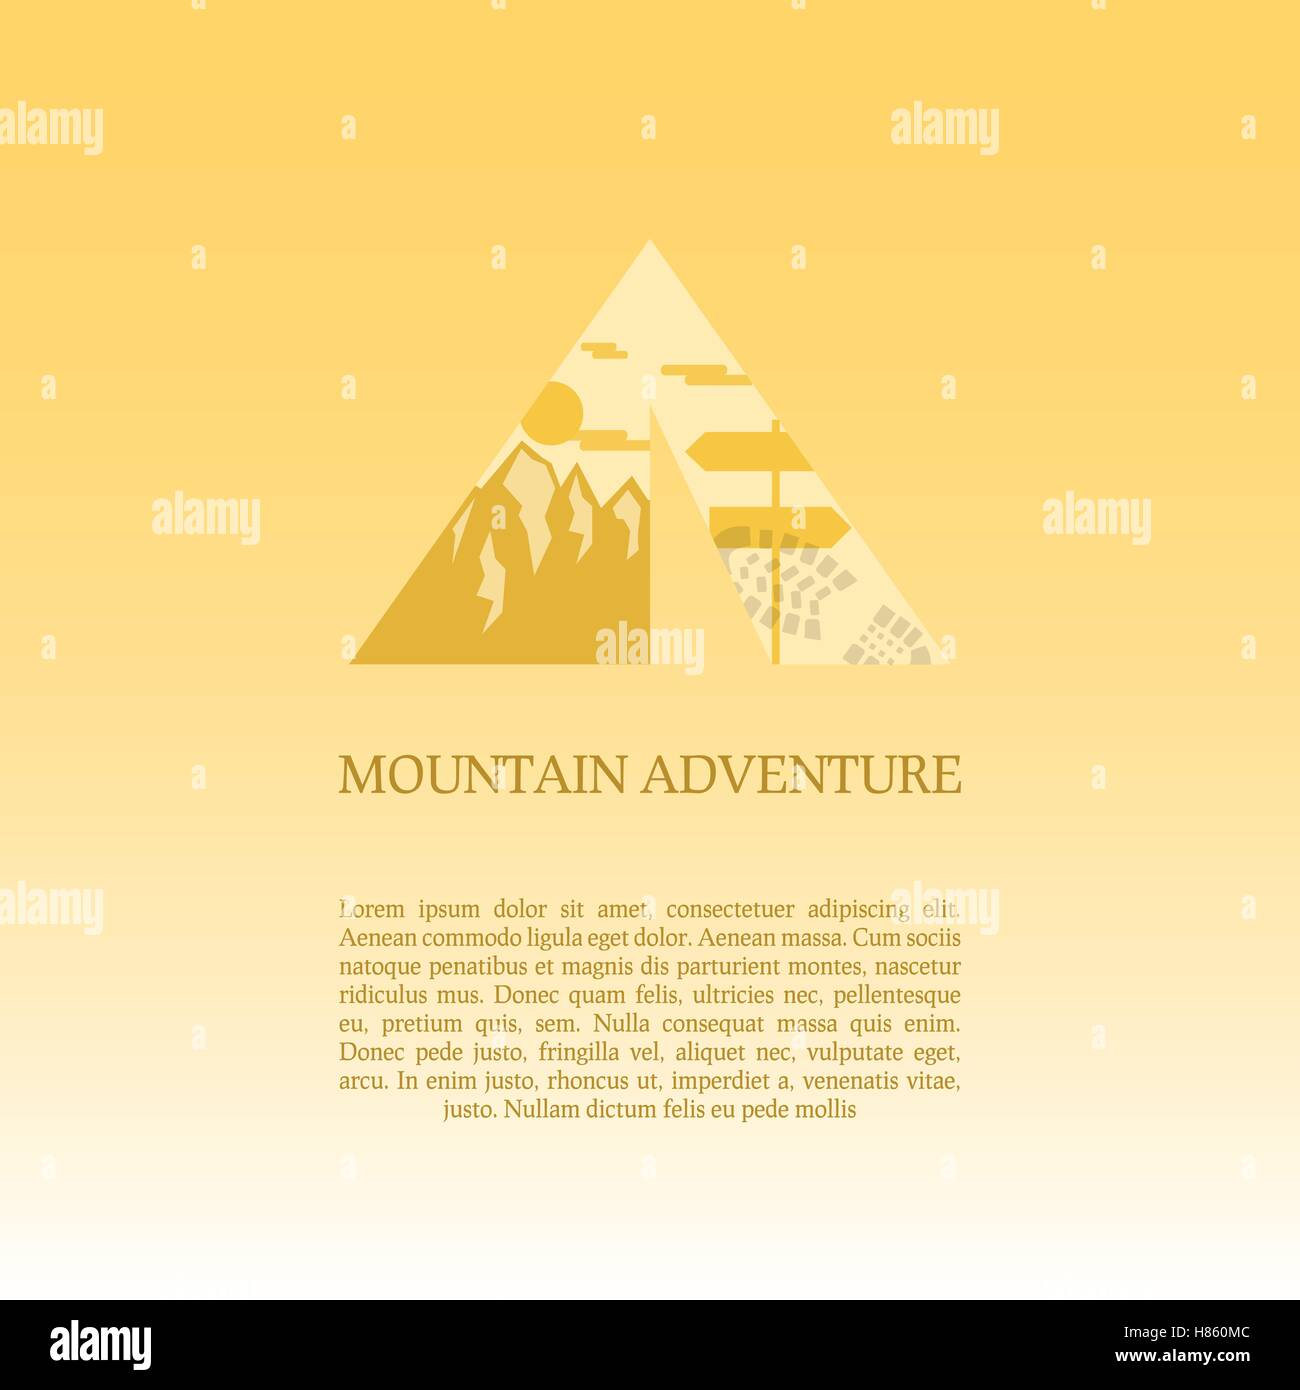 Theme Hiking Path Imágenes De Stock & Theme Hiking Path Fotos De ...